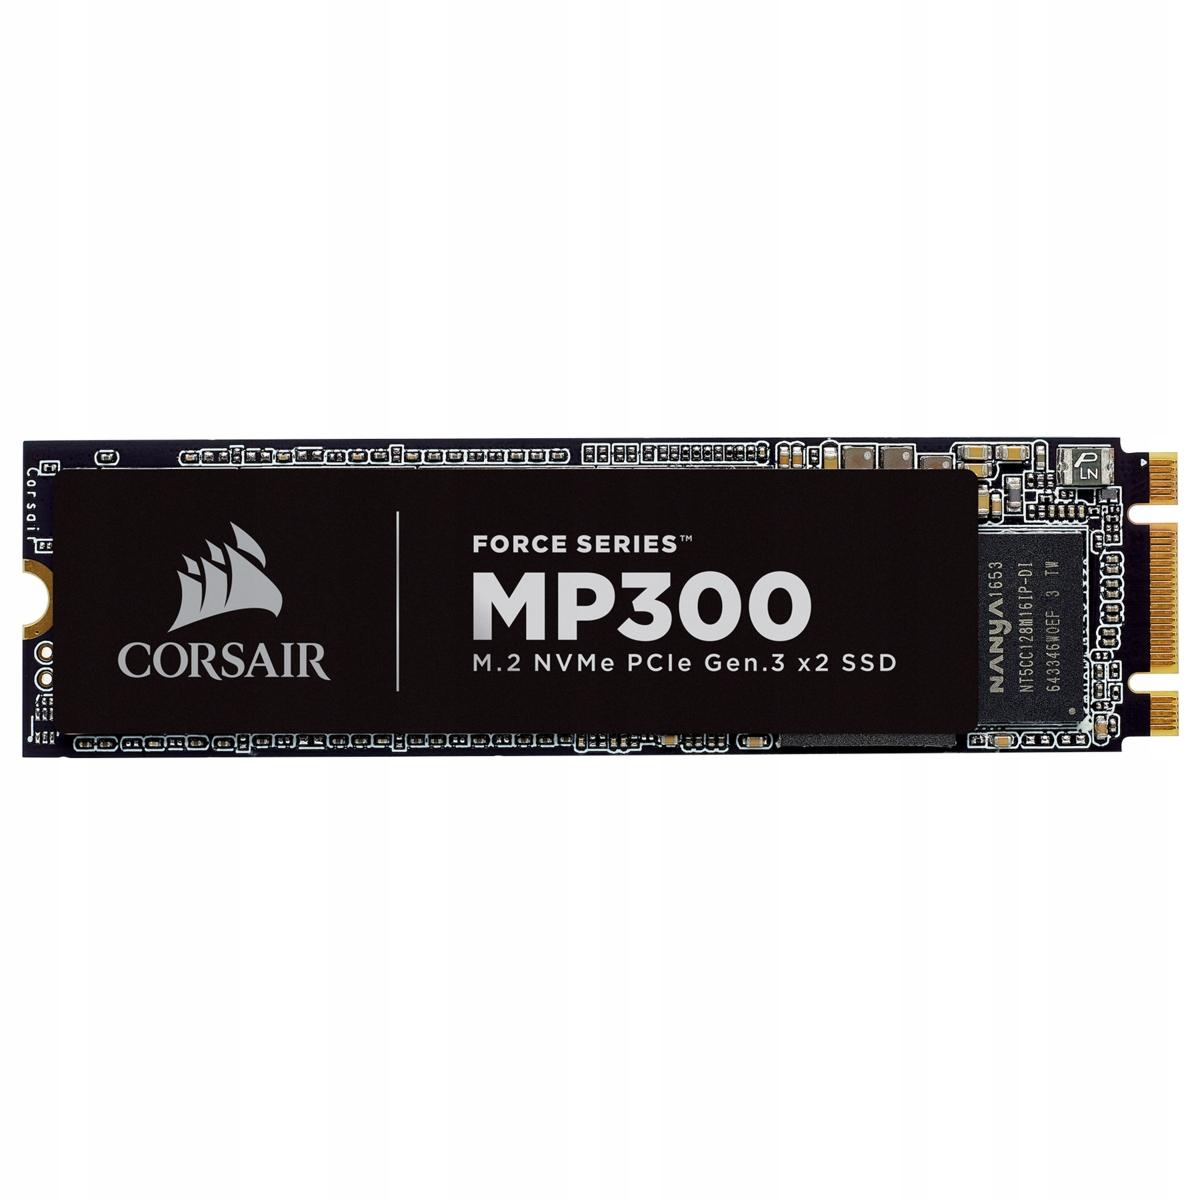 CORSAIR FORCE MP300 960 GB DYSK SSD M.2 2280 PCIe